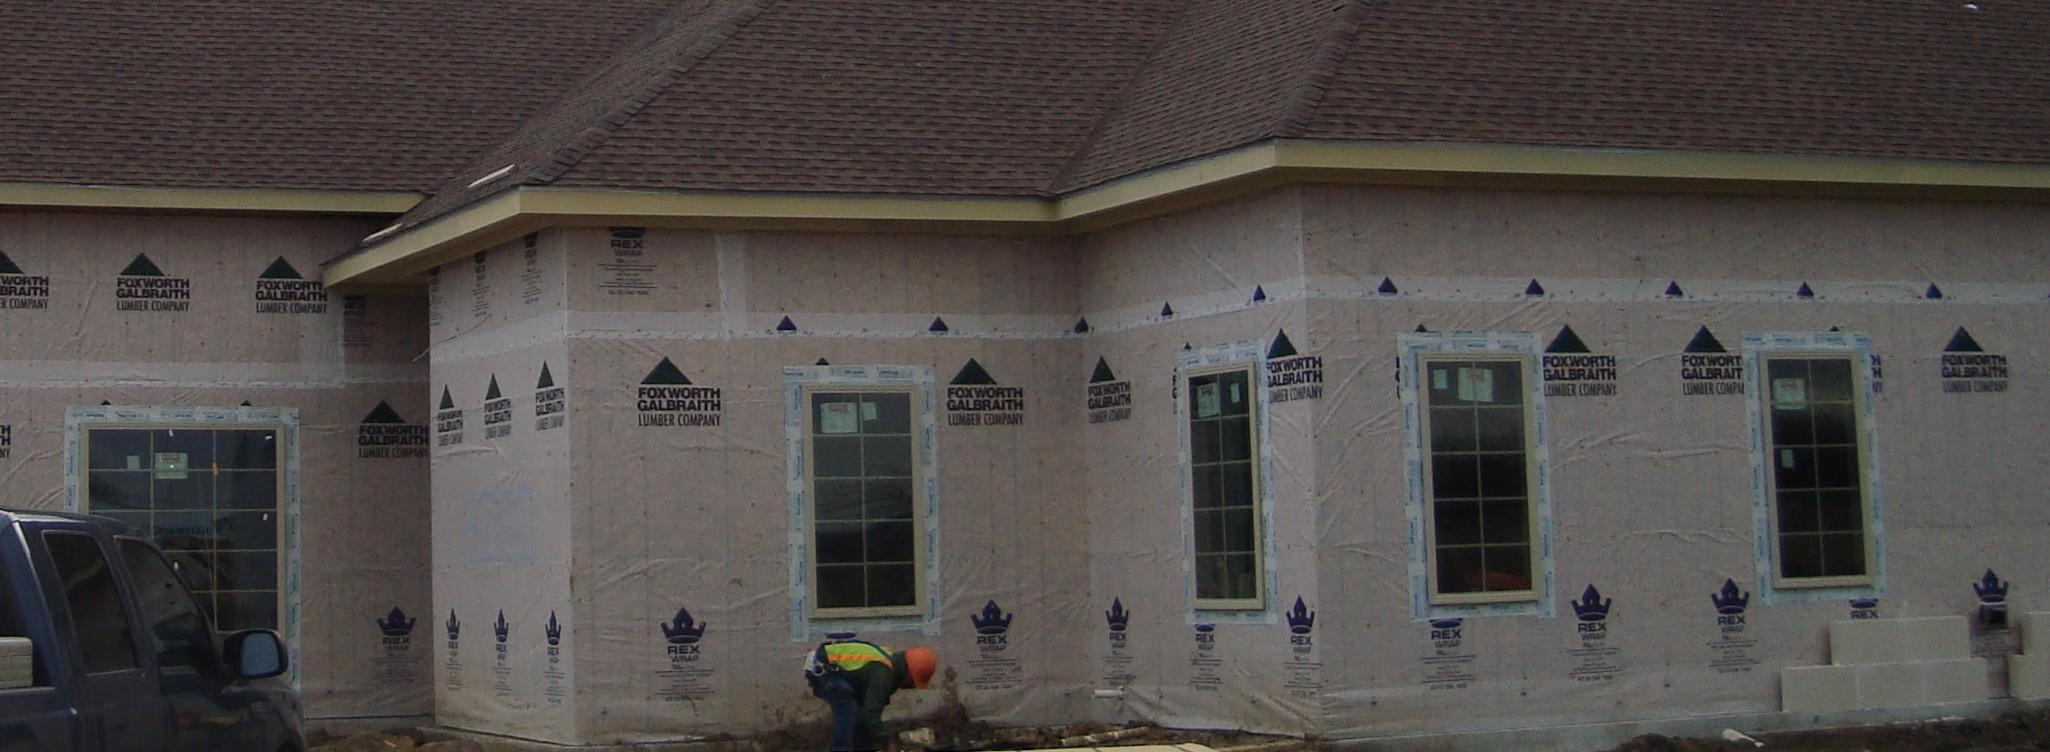 Mansfield Medical Construction Exterior Siding